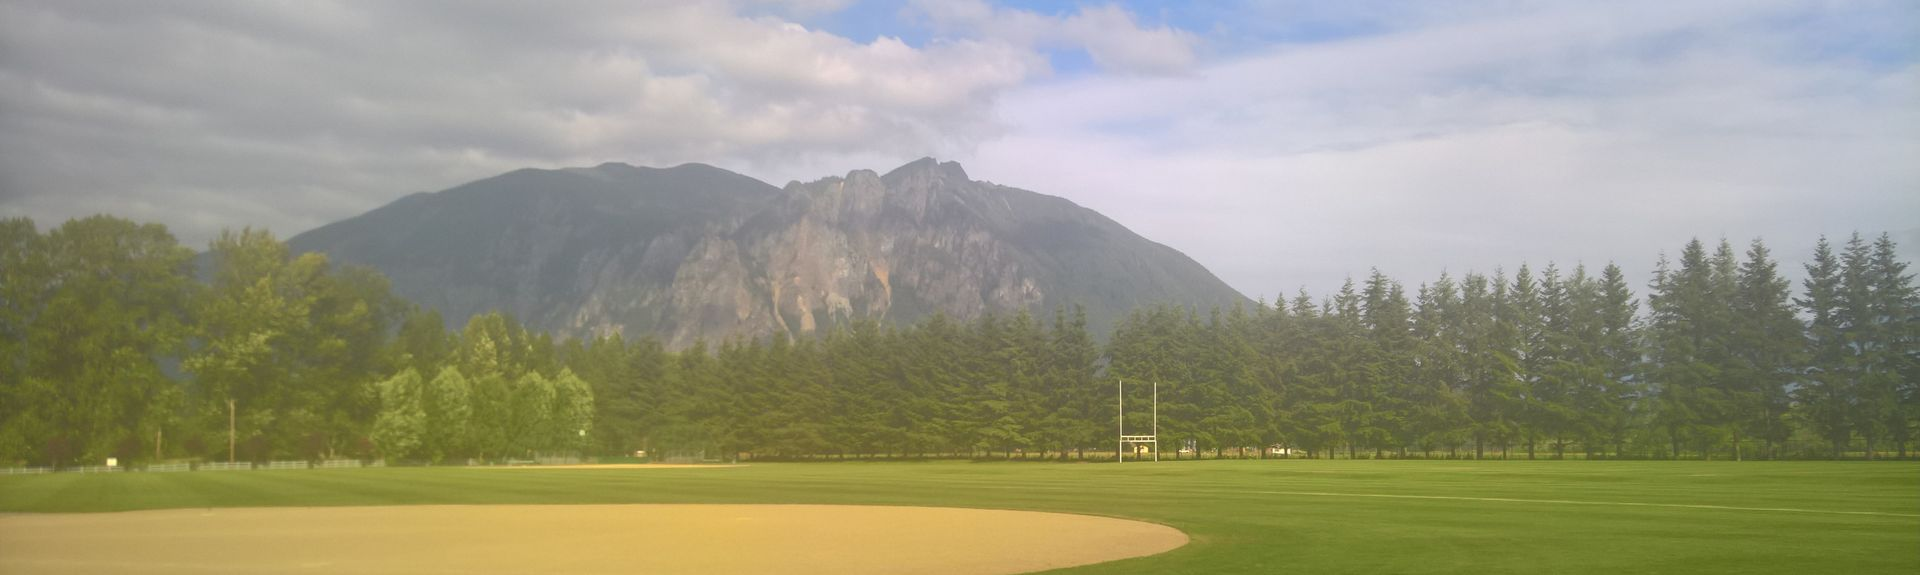 Mount Si Golf Course, Snoqualmie, WA, USA